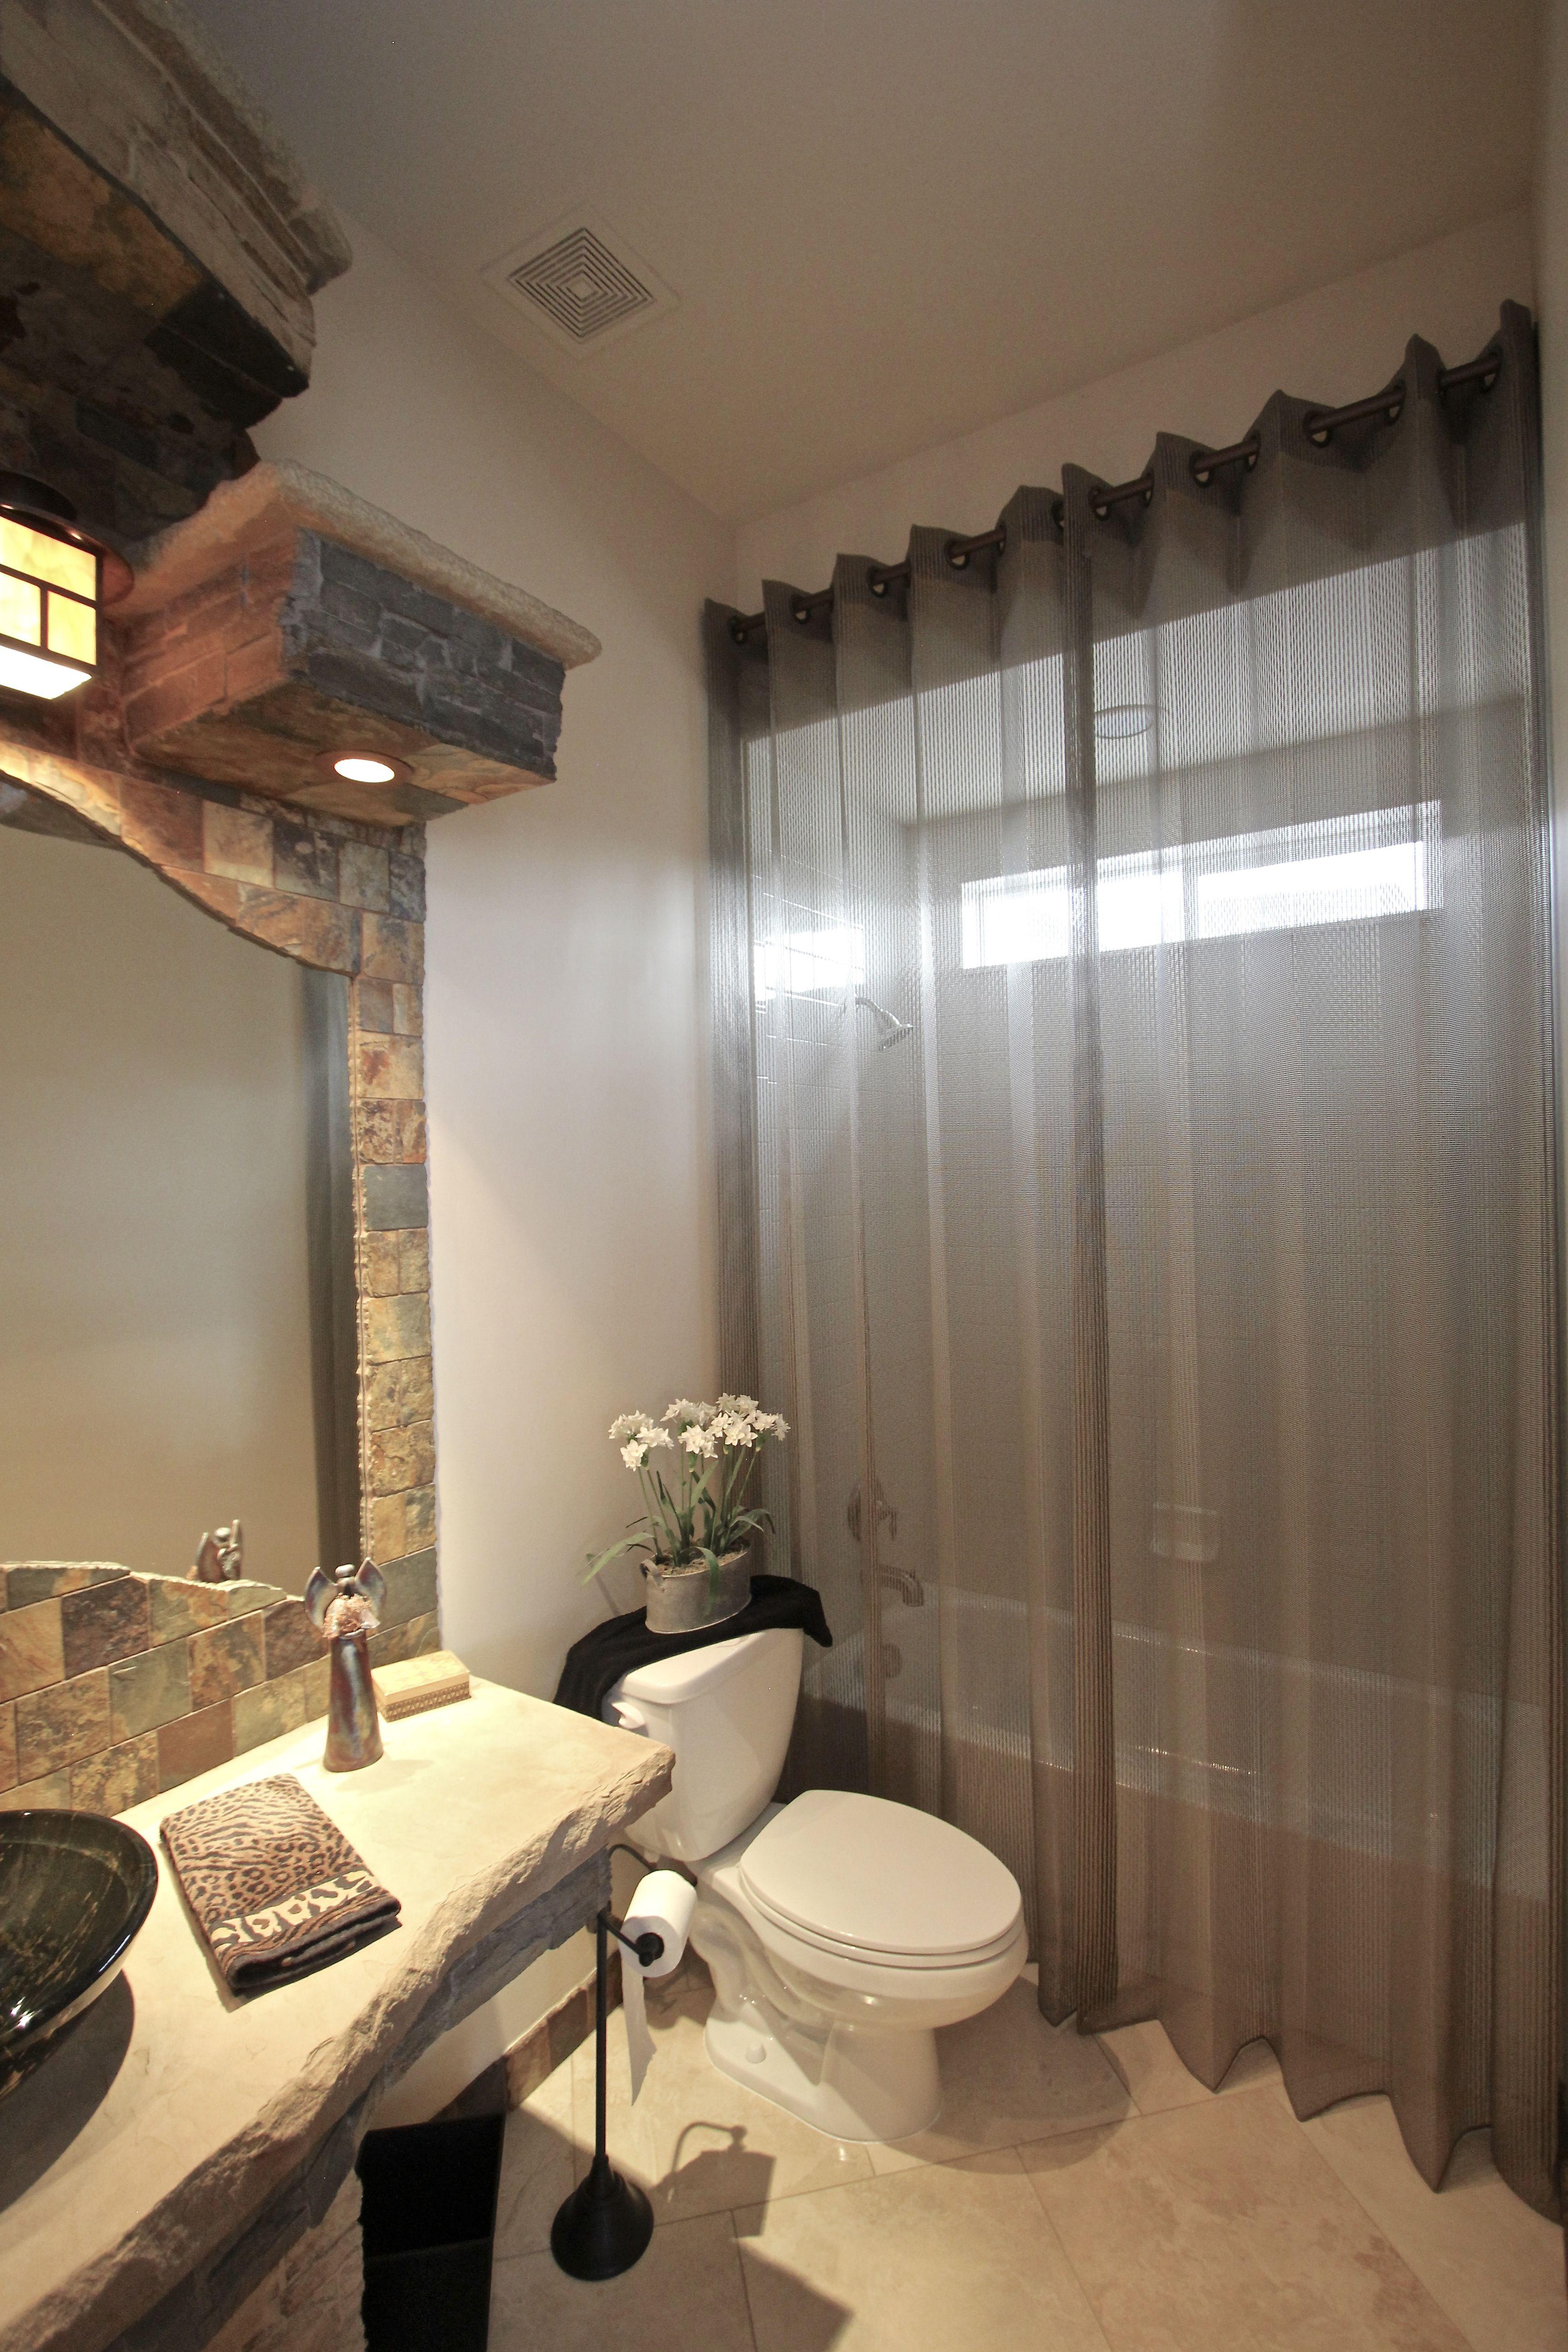 Shower curtain drape to hide tile, but let light through-Flair 21 ...